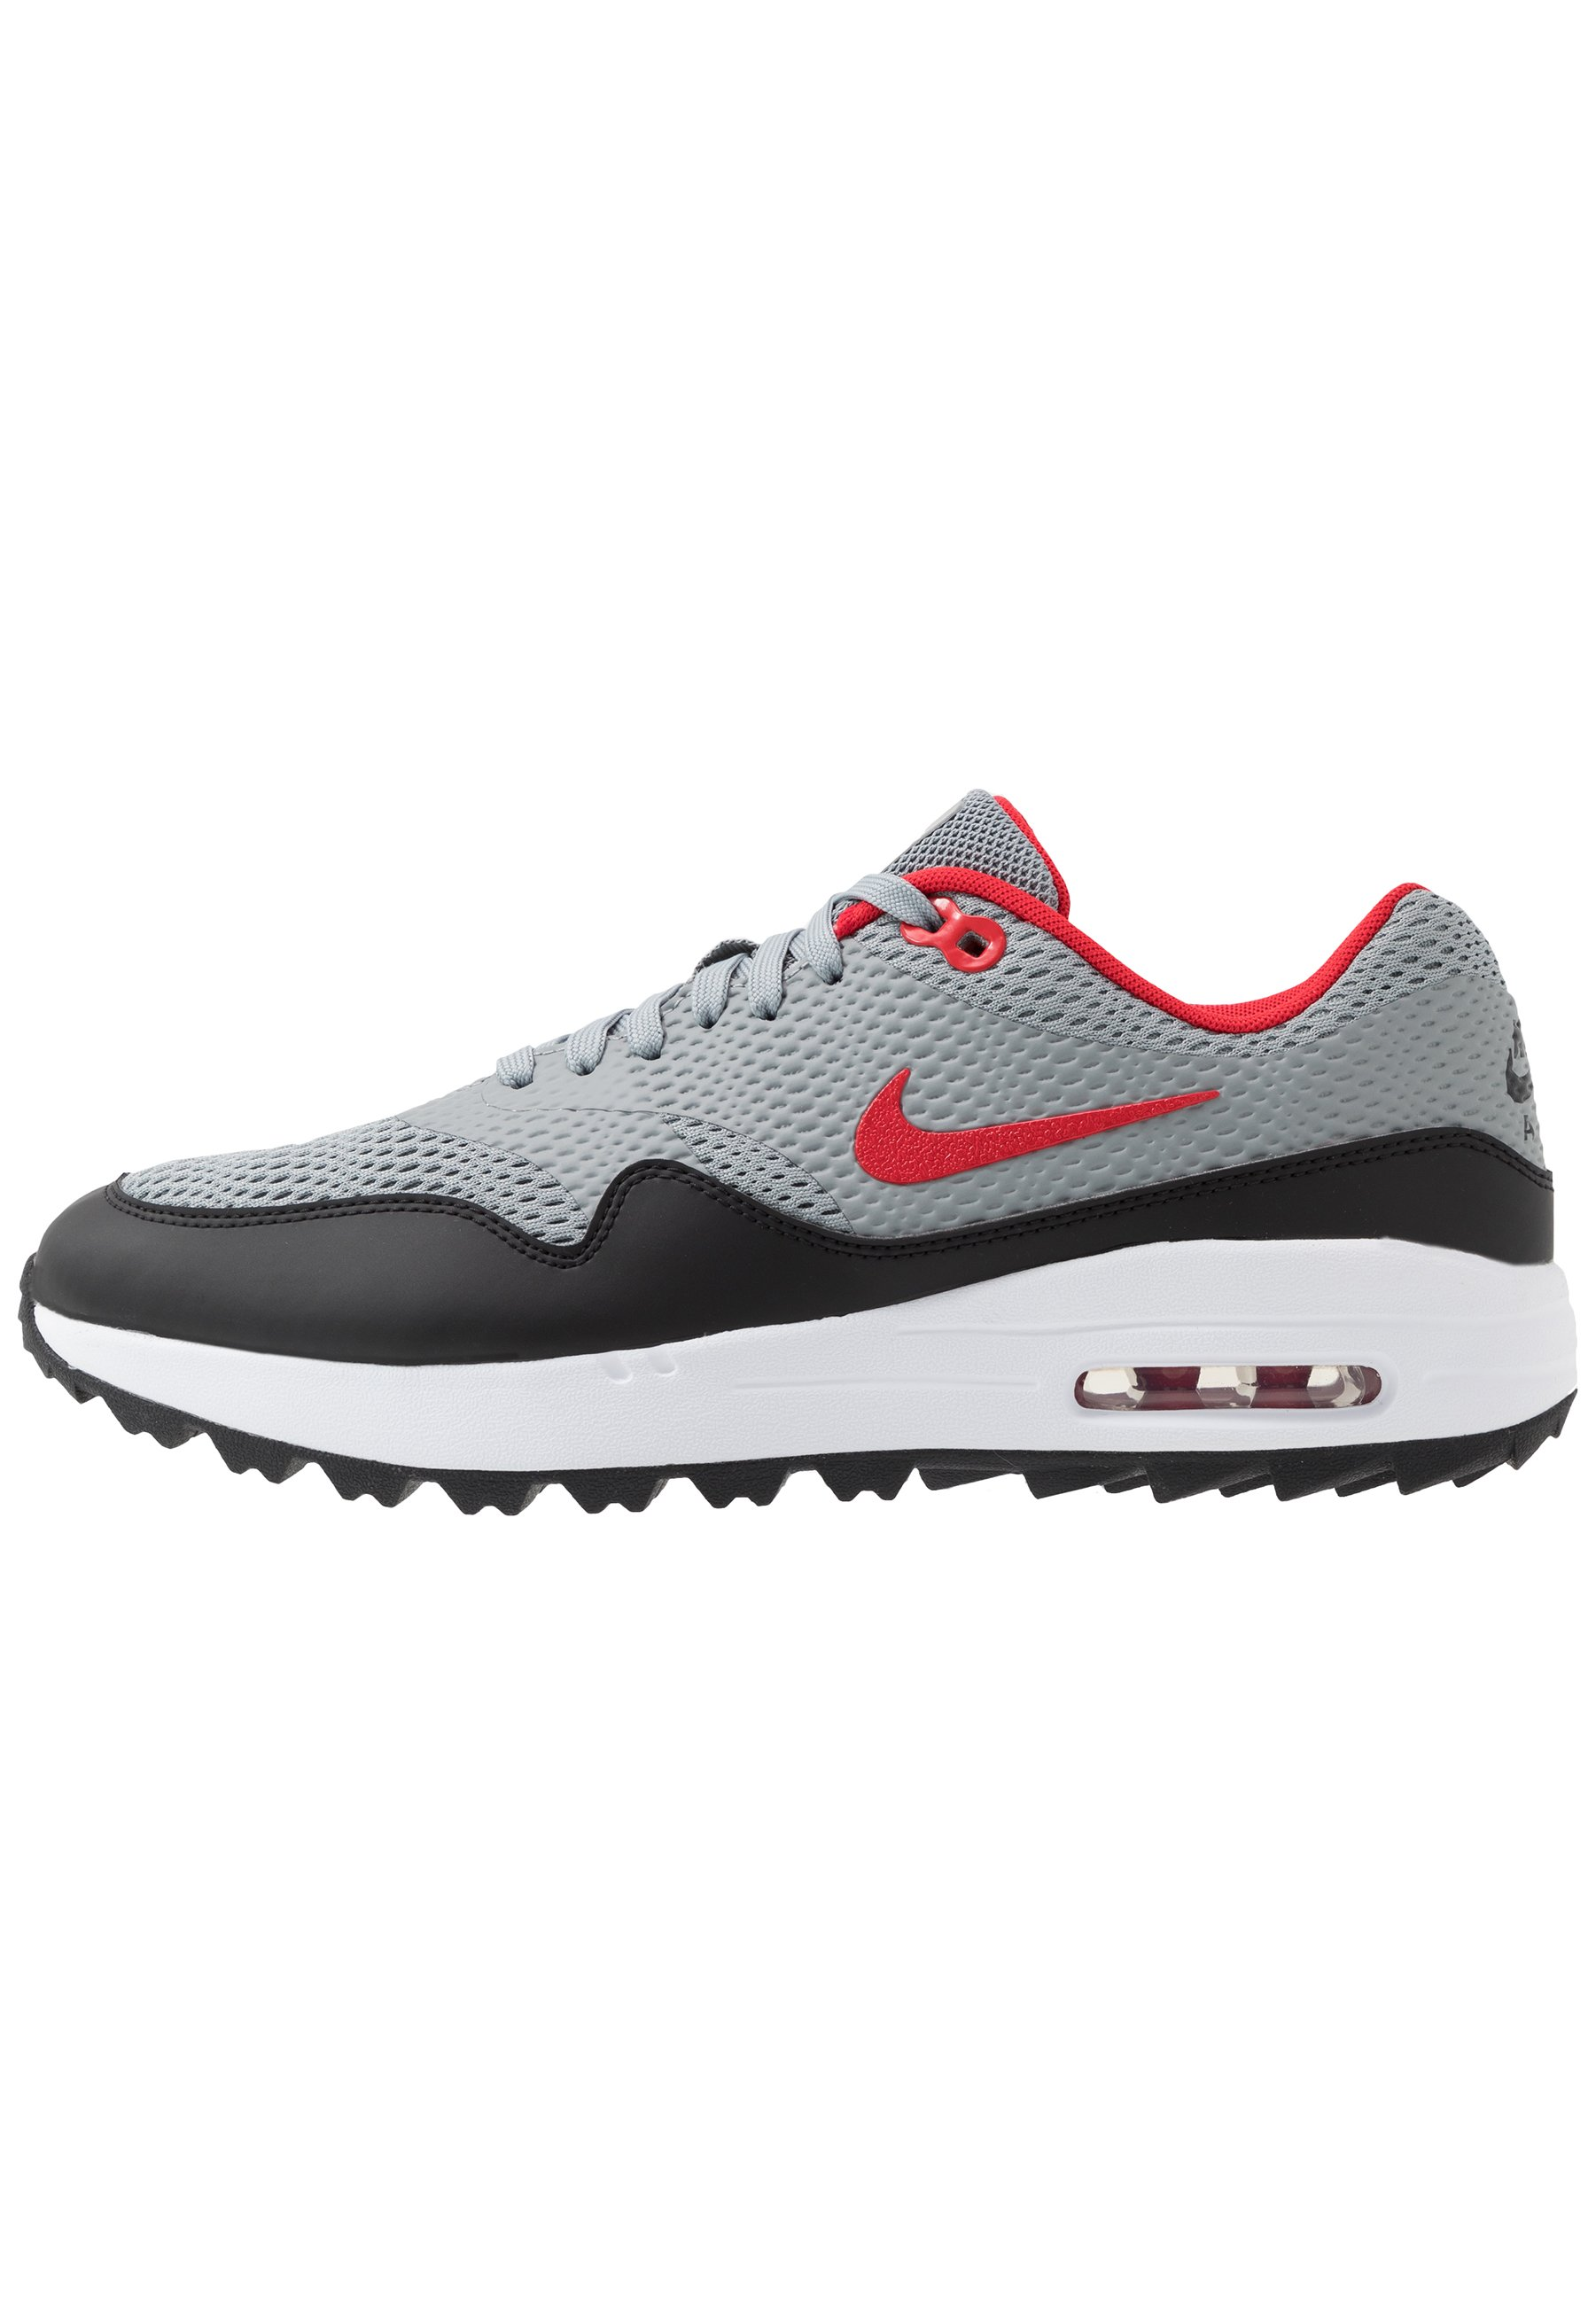 chaussure nike golf